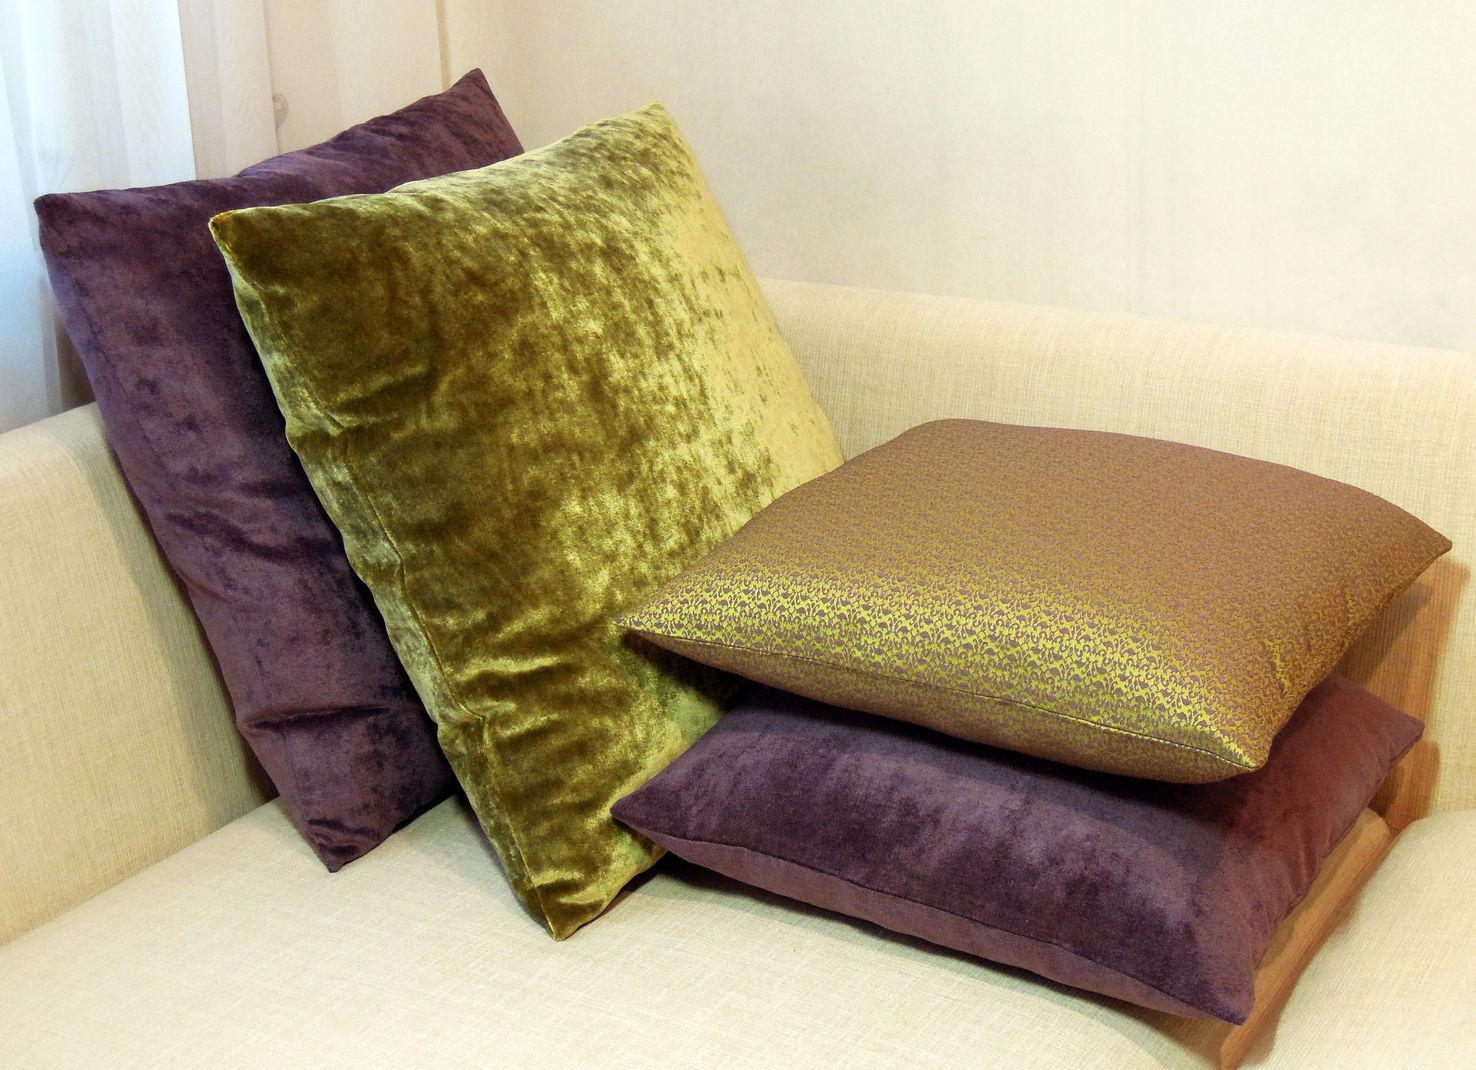 Ткани для чехлов подушек и обивки диванов